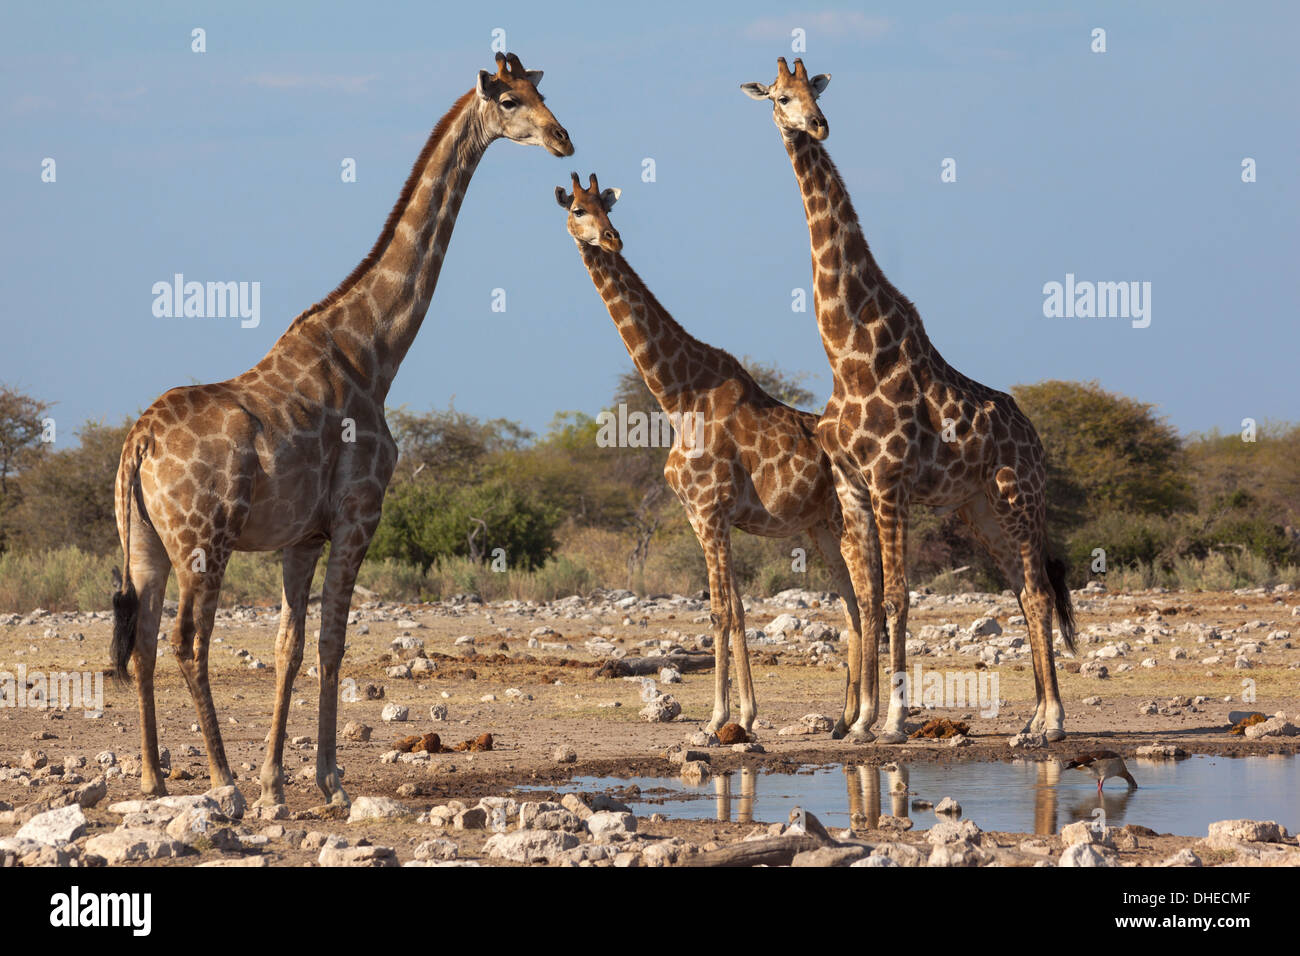 Giraffe (Giraffa camelopardalis) gathered at waterhole, Etosha National Park, Namibia, Africa - Stock Image